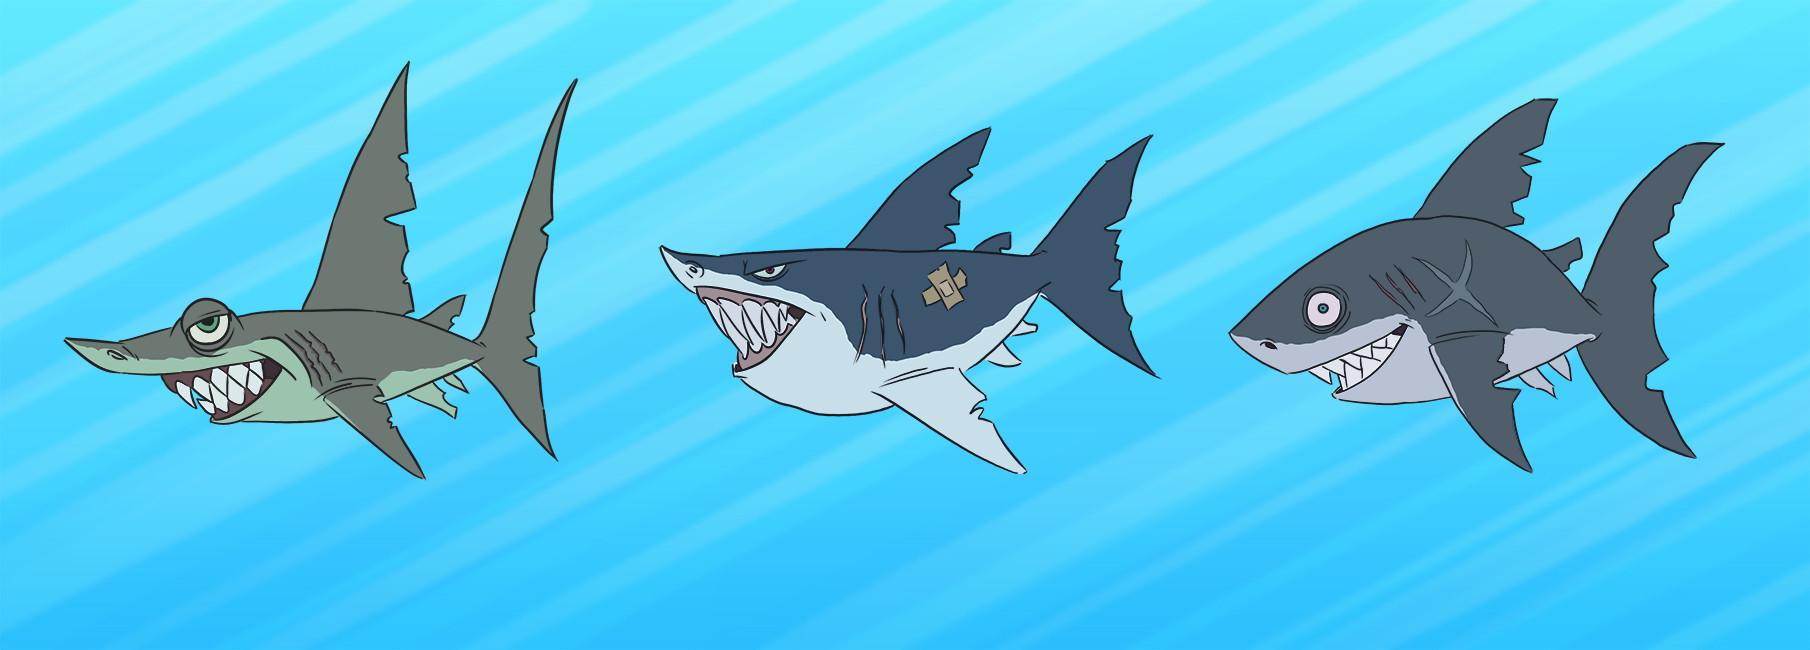 Jose samaniego sketch 3 sharks